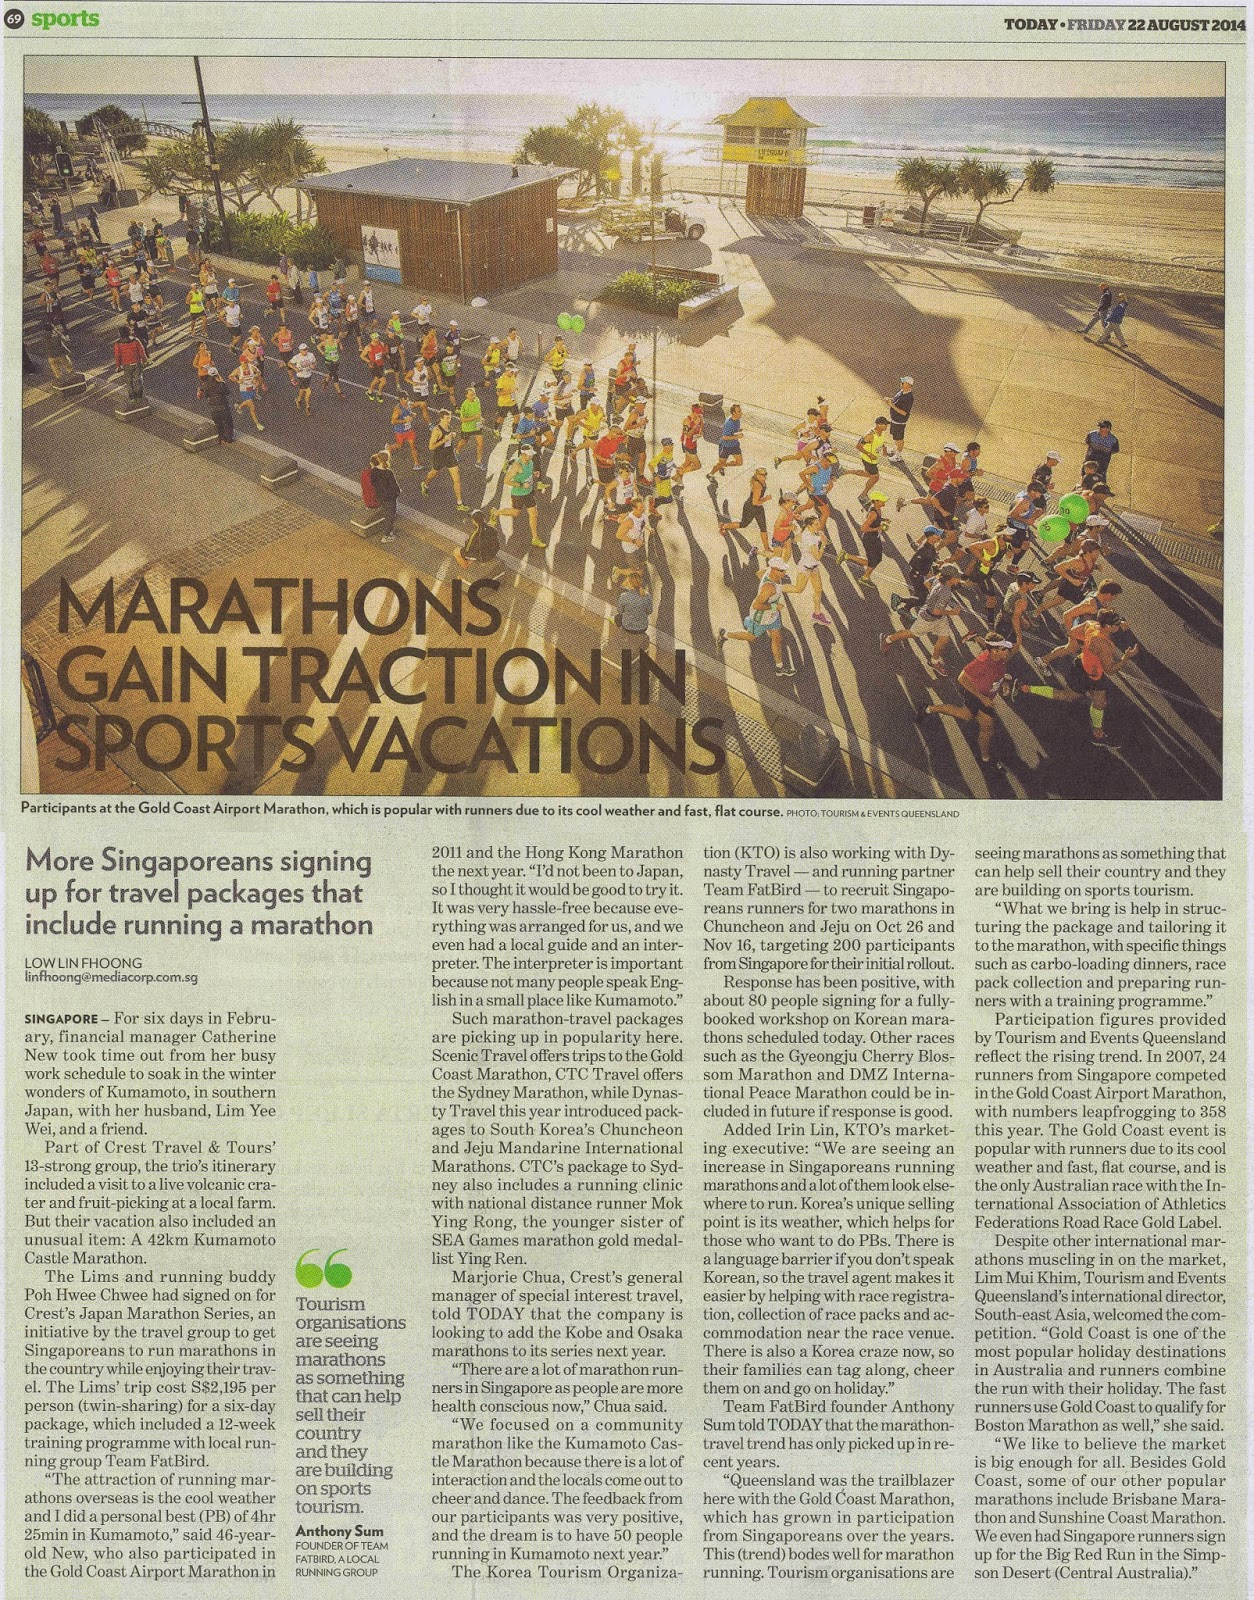 International Marathon Travellers